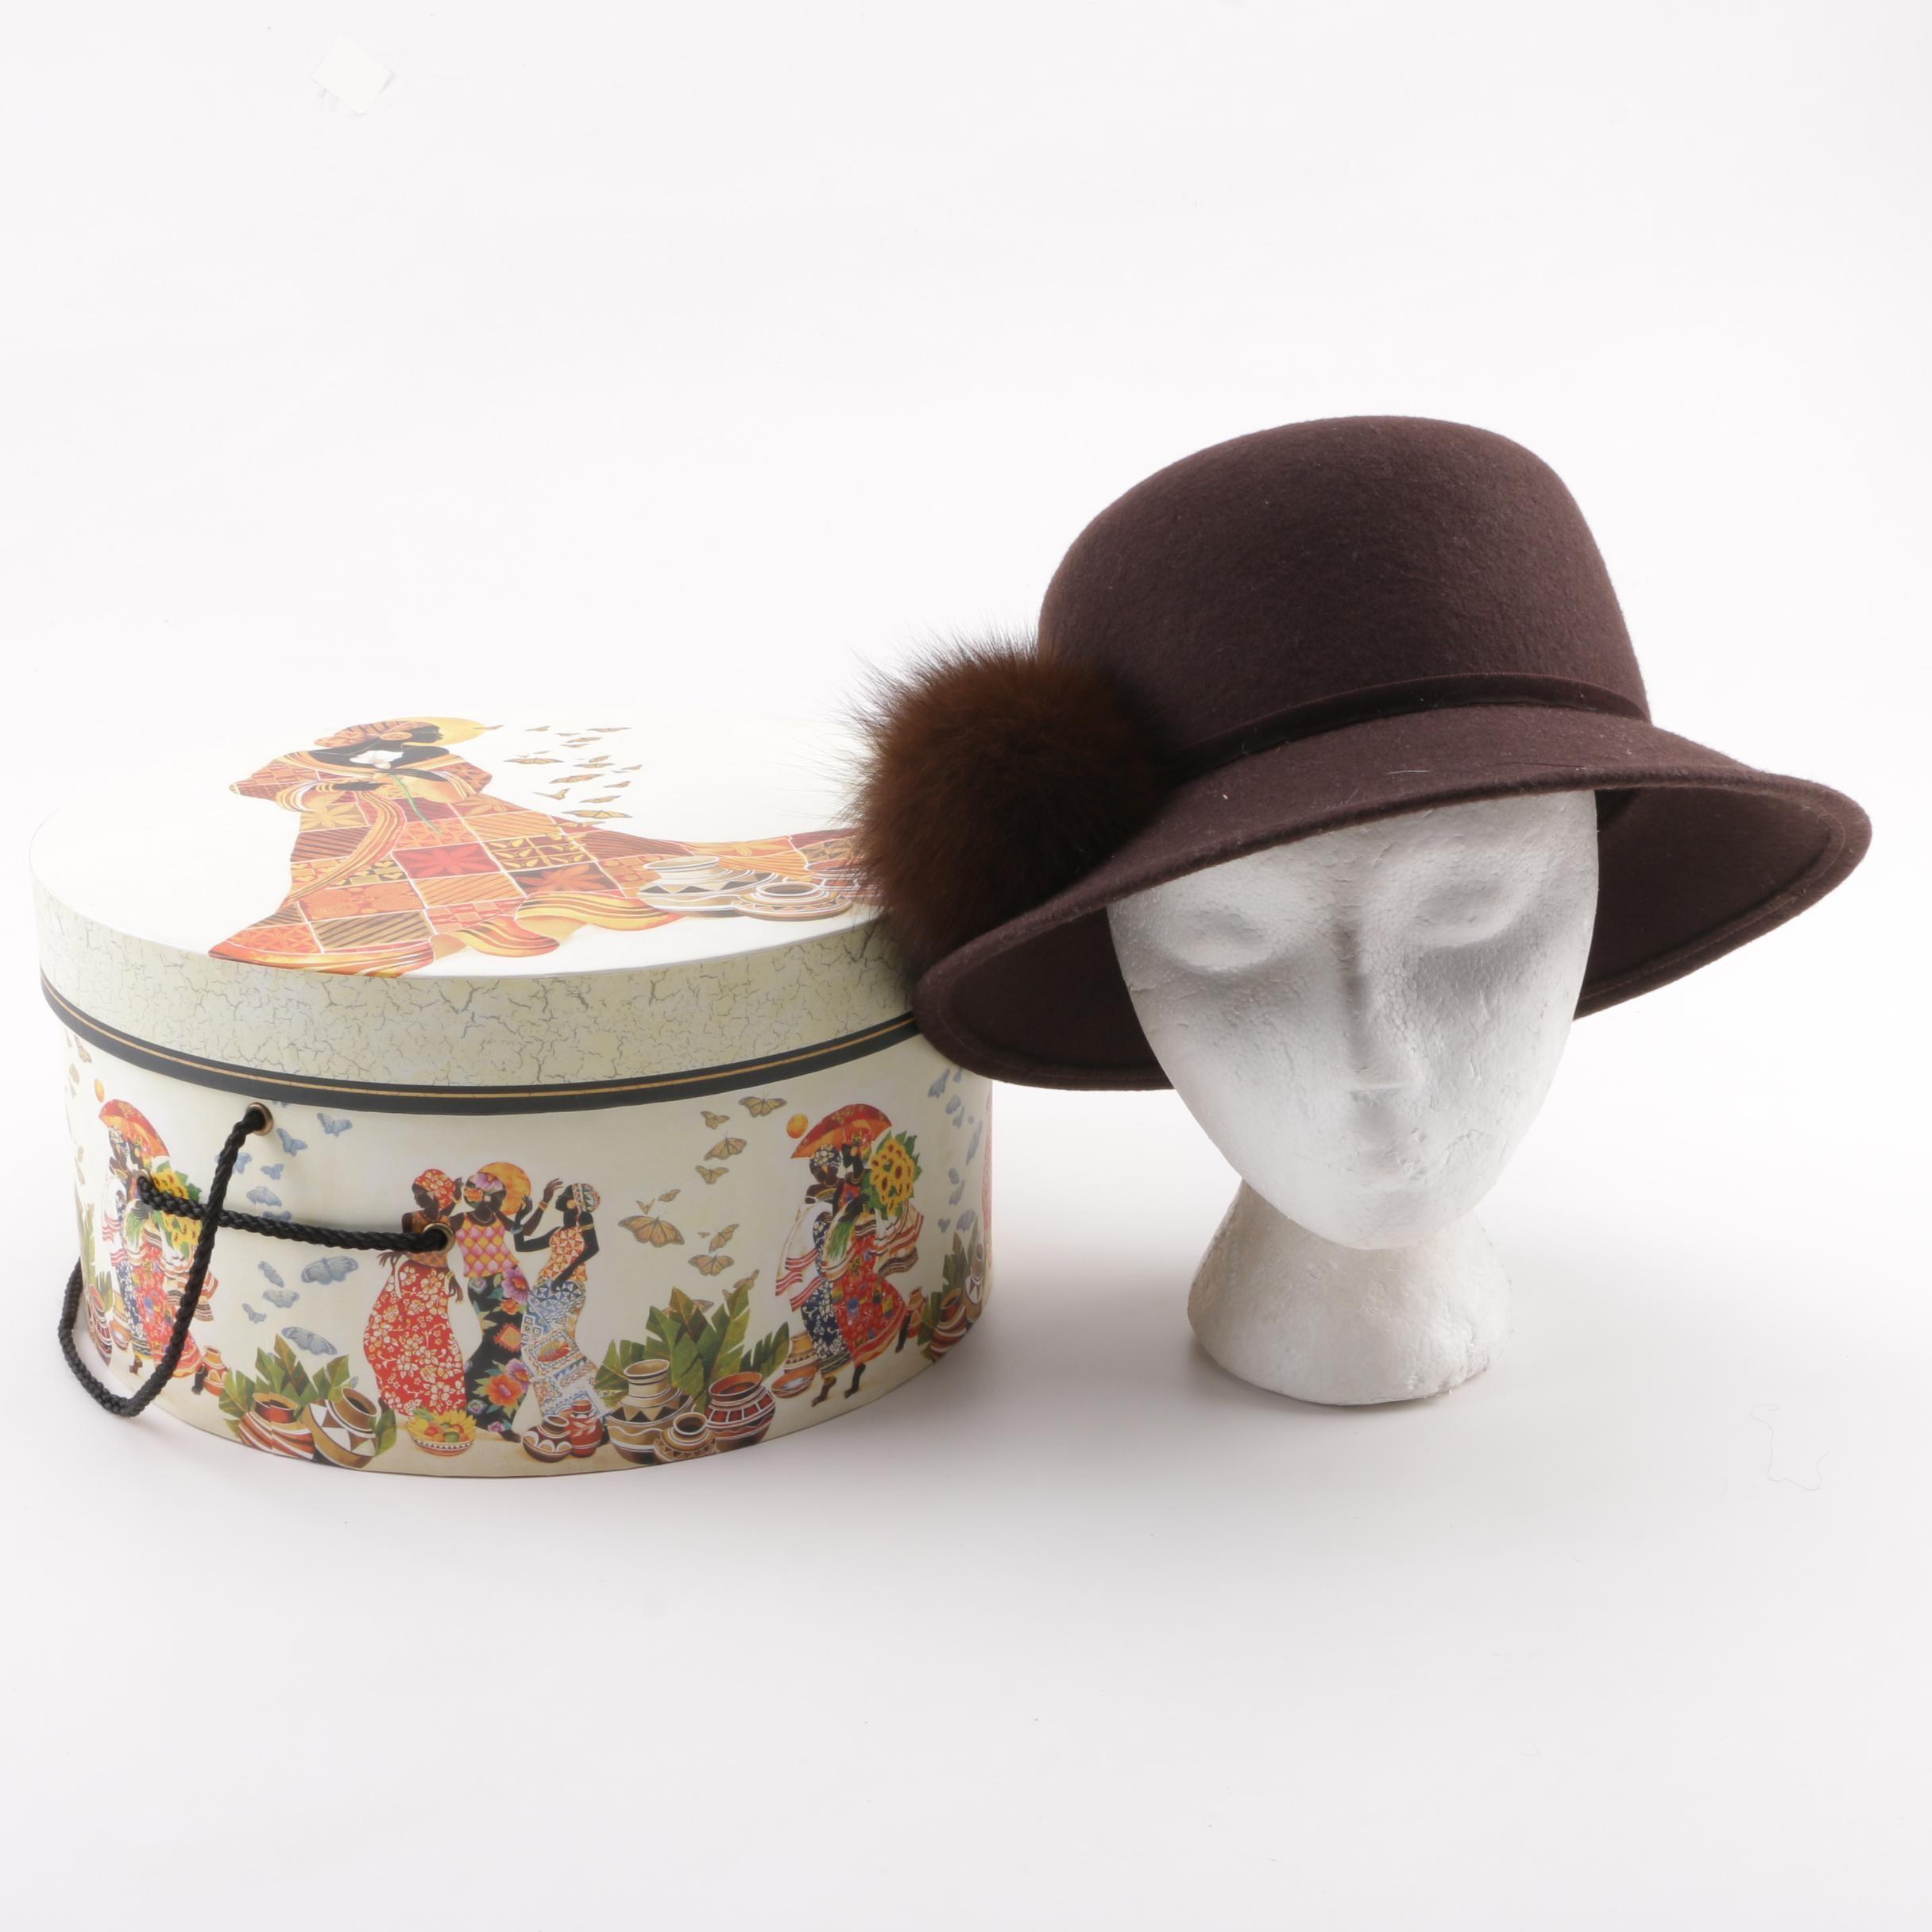 Women's Circa 1980s Studio Kōkin Brown Felted Wool Hat with Fox Fur Accent